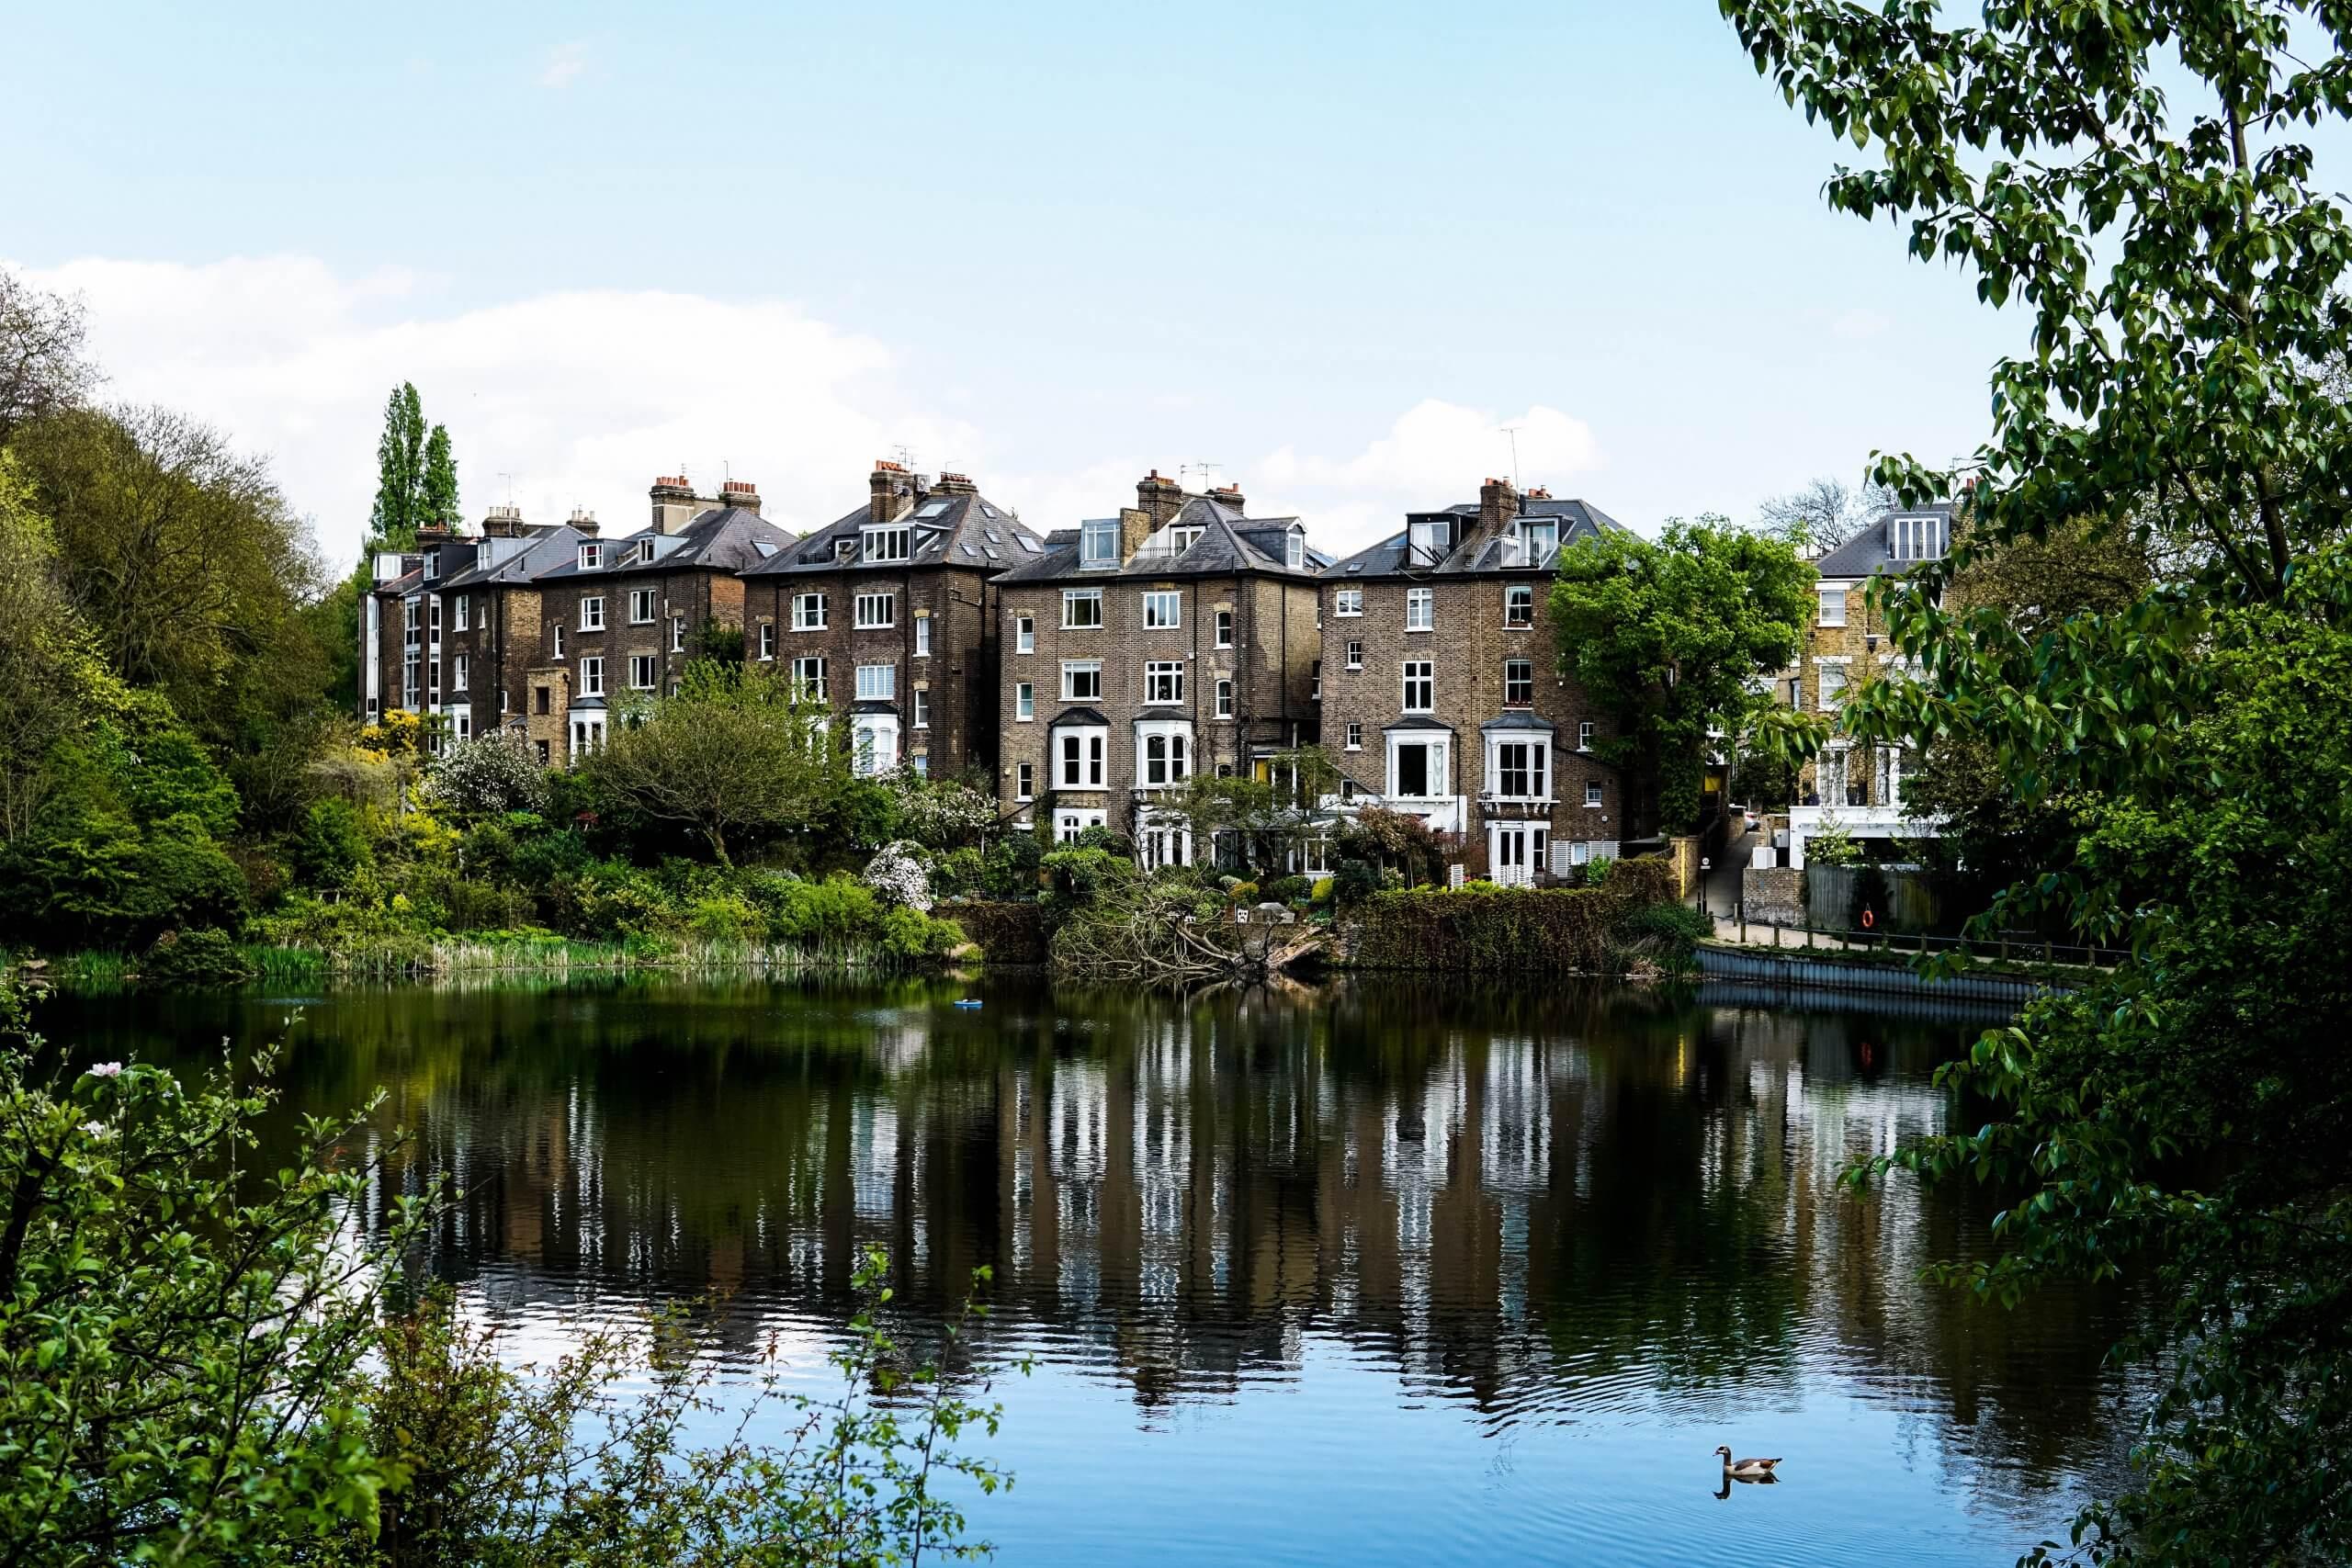 UK experiencing shortfalls in housing supply